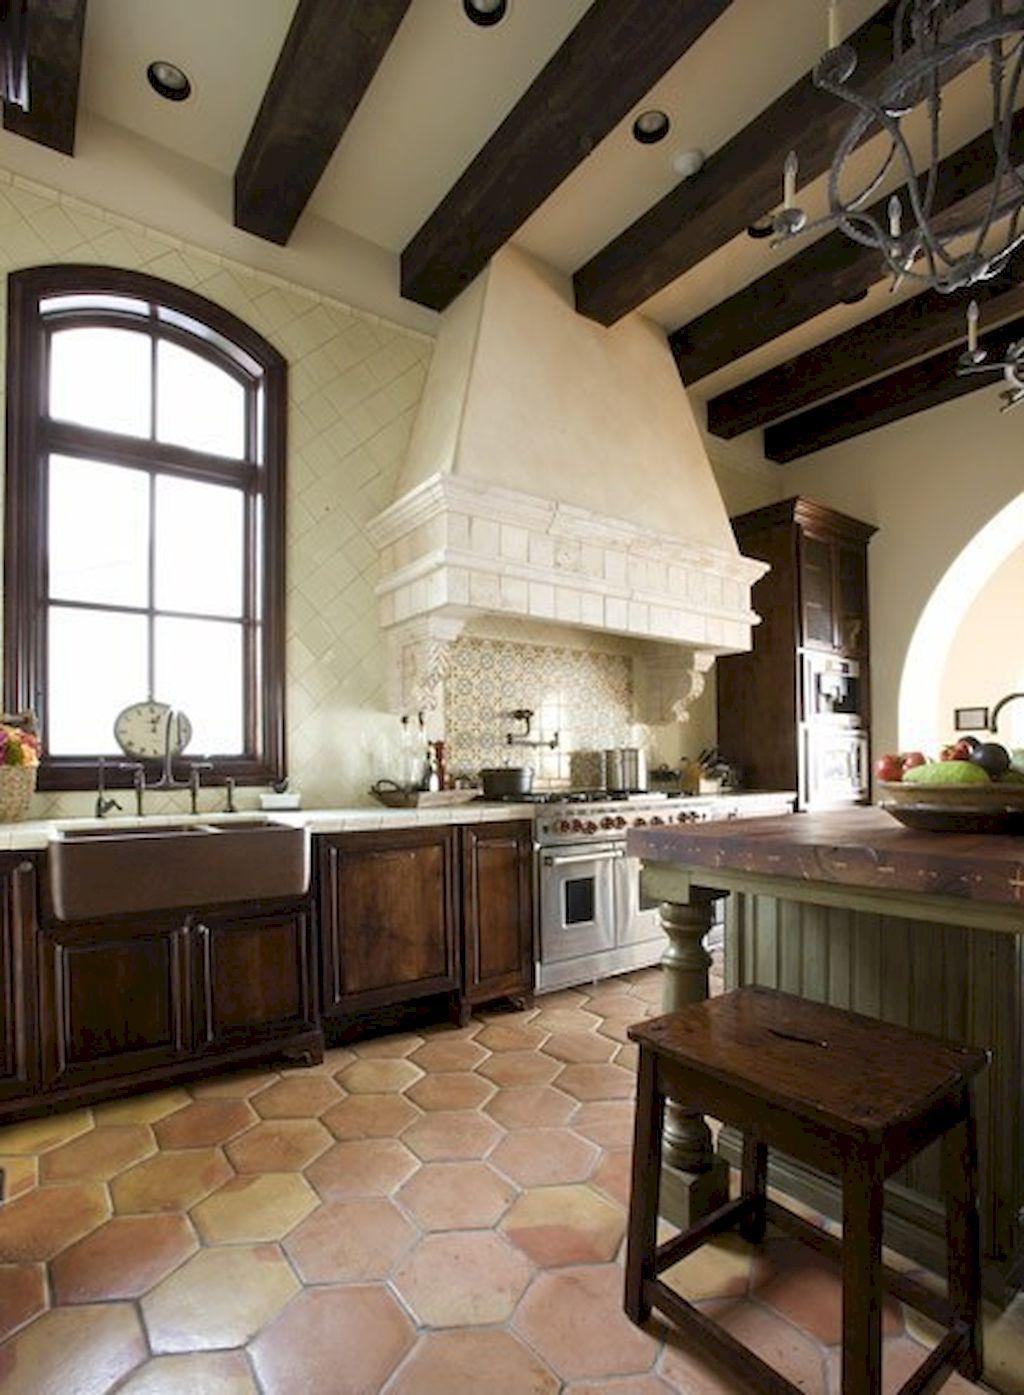 70 Tile Floor Farmhouse Kitchen Decor Ideas